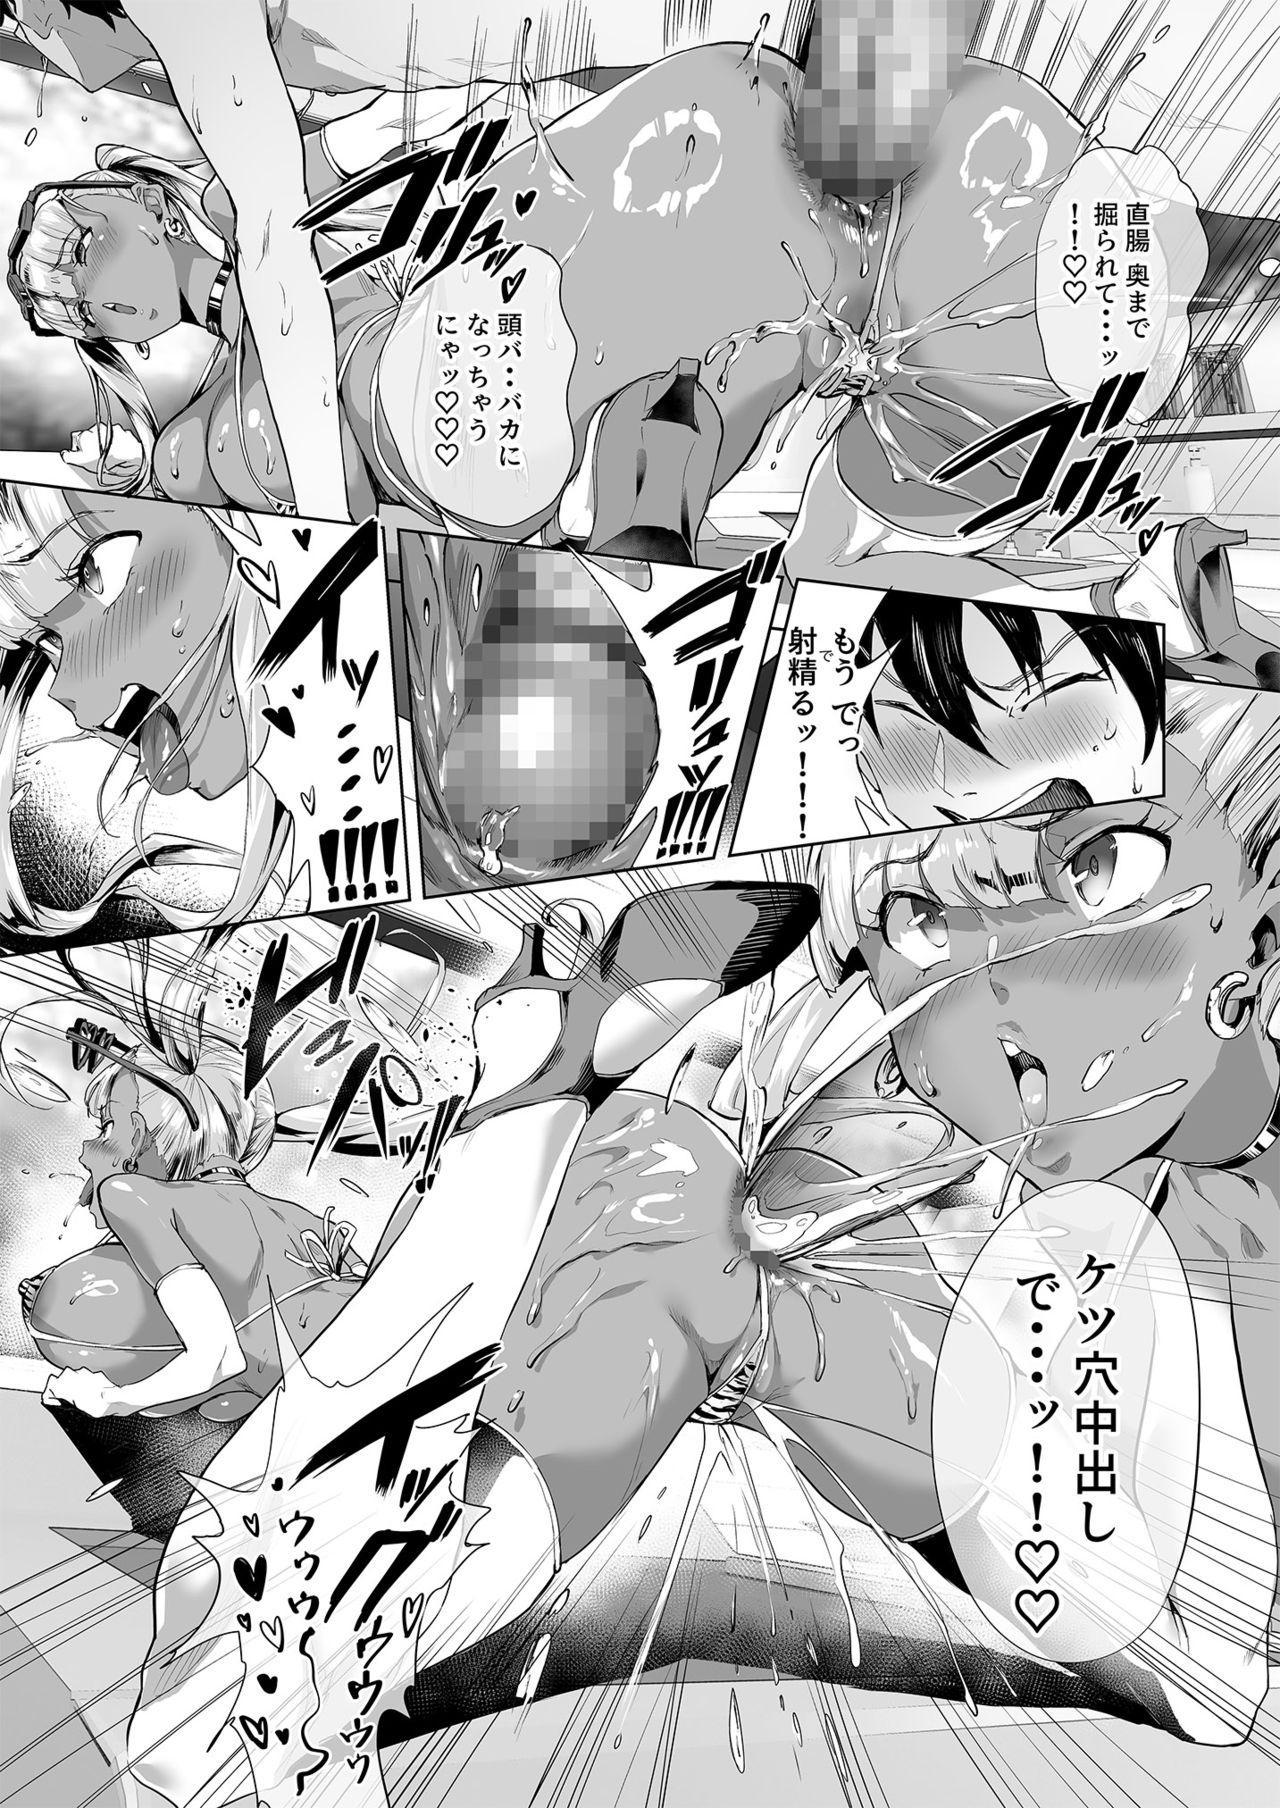 Harem de NEWGAME+!! vol.2 ~VR Eroge de Ittara Mirai wa Harem Sekai ni Natte Ita!? - New Game With My Harem!! 19